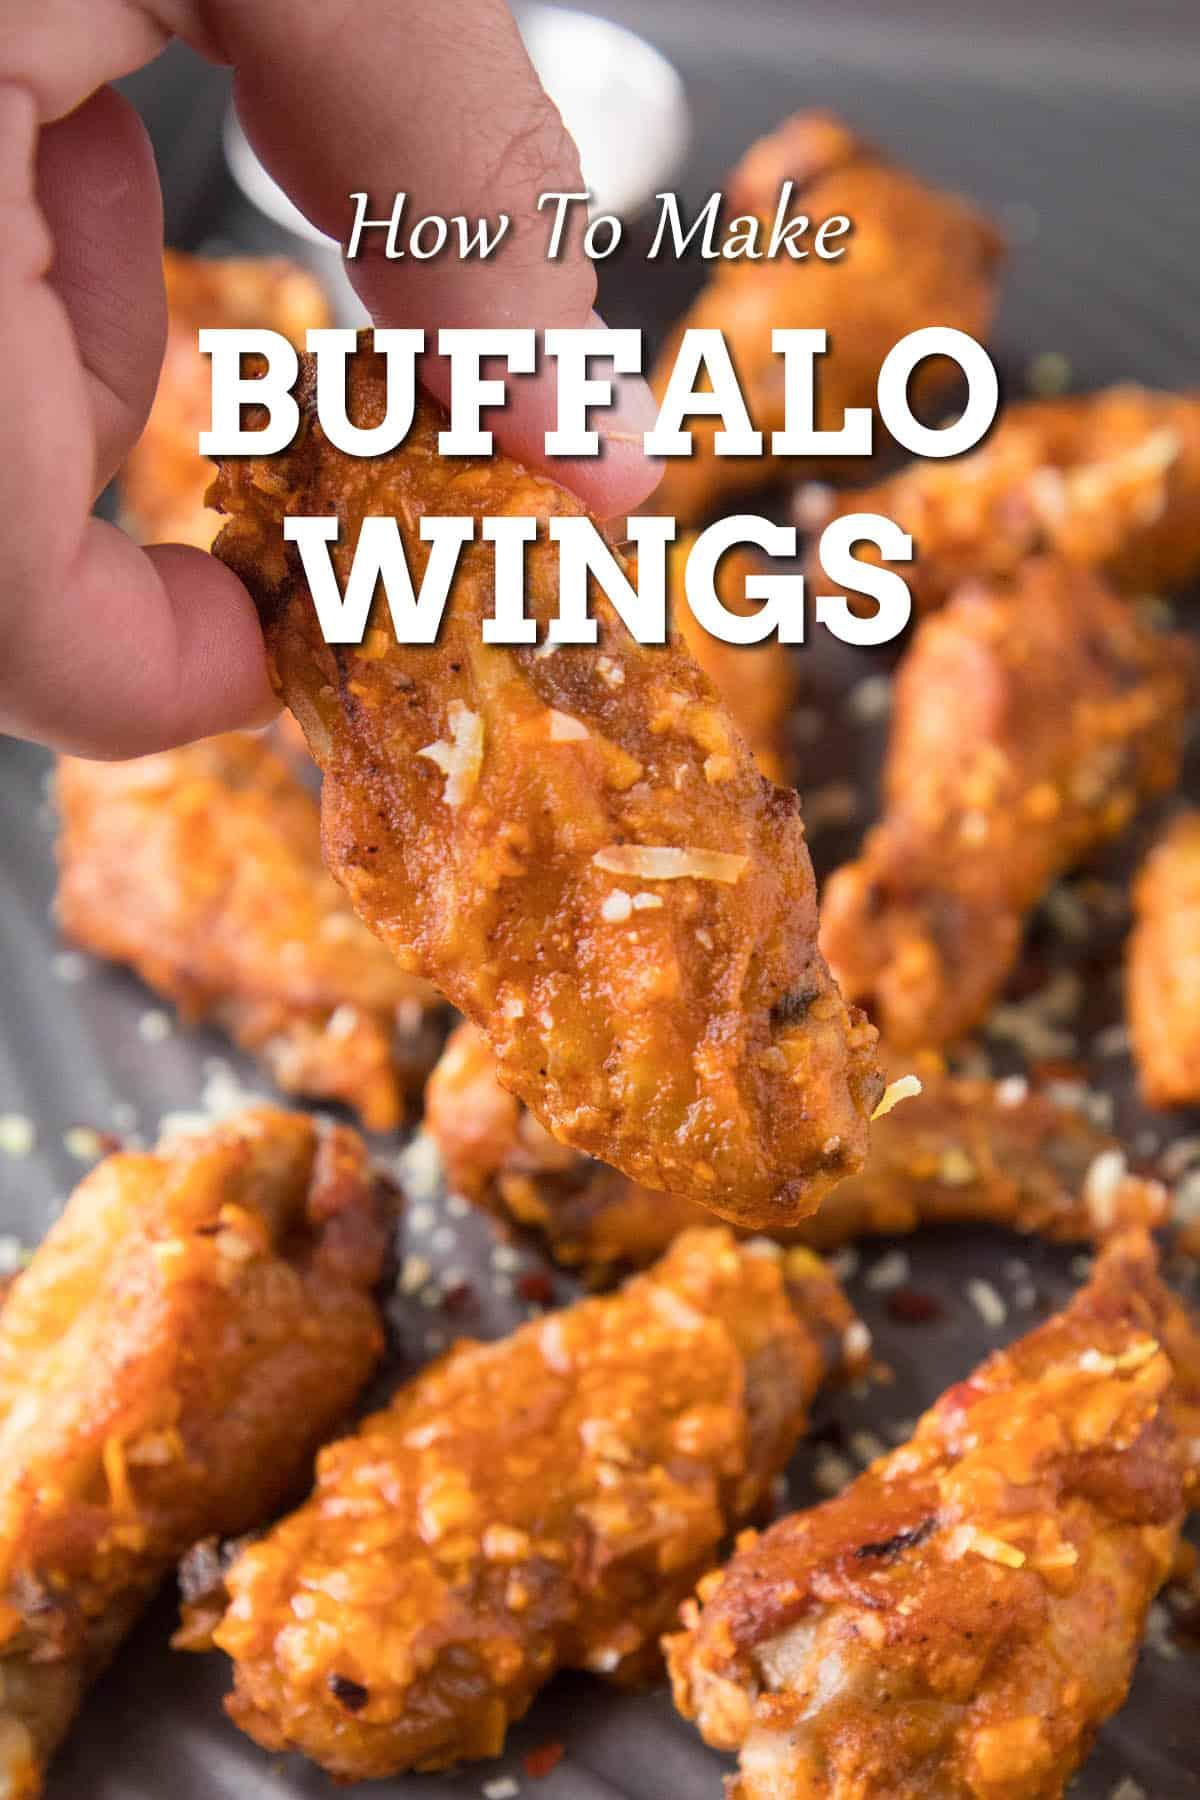 How to Make Buffalo Wings